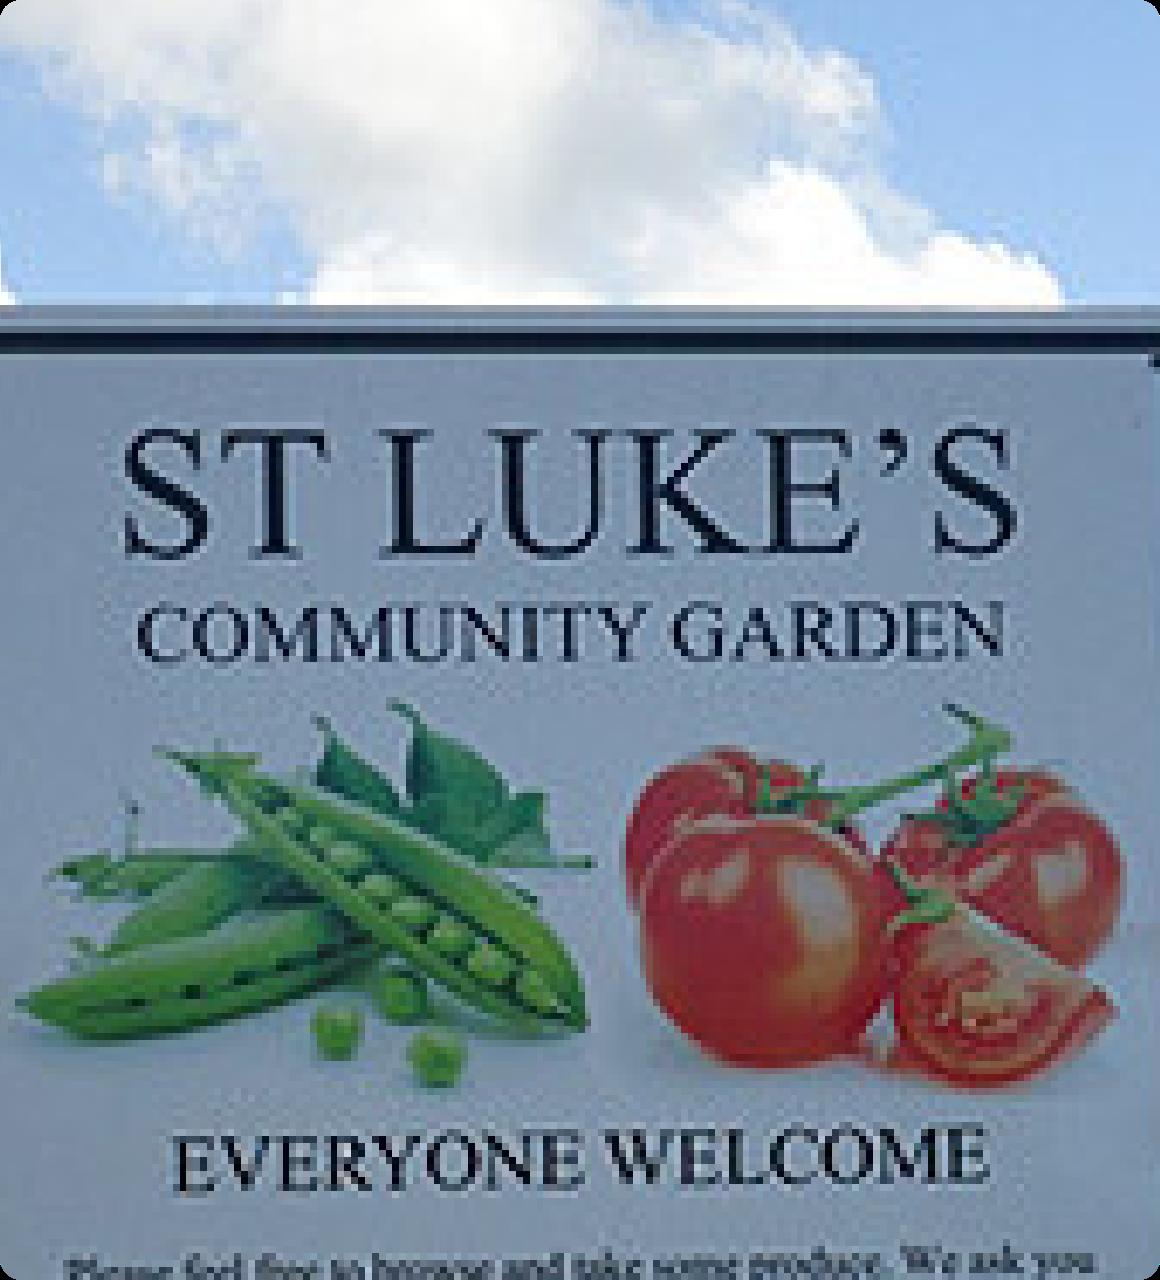 Community Garden »